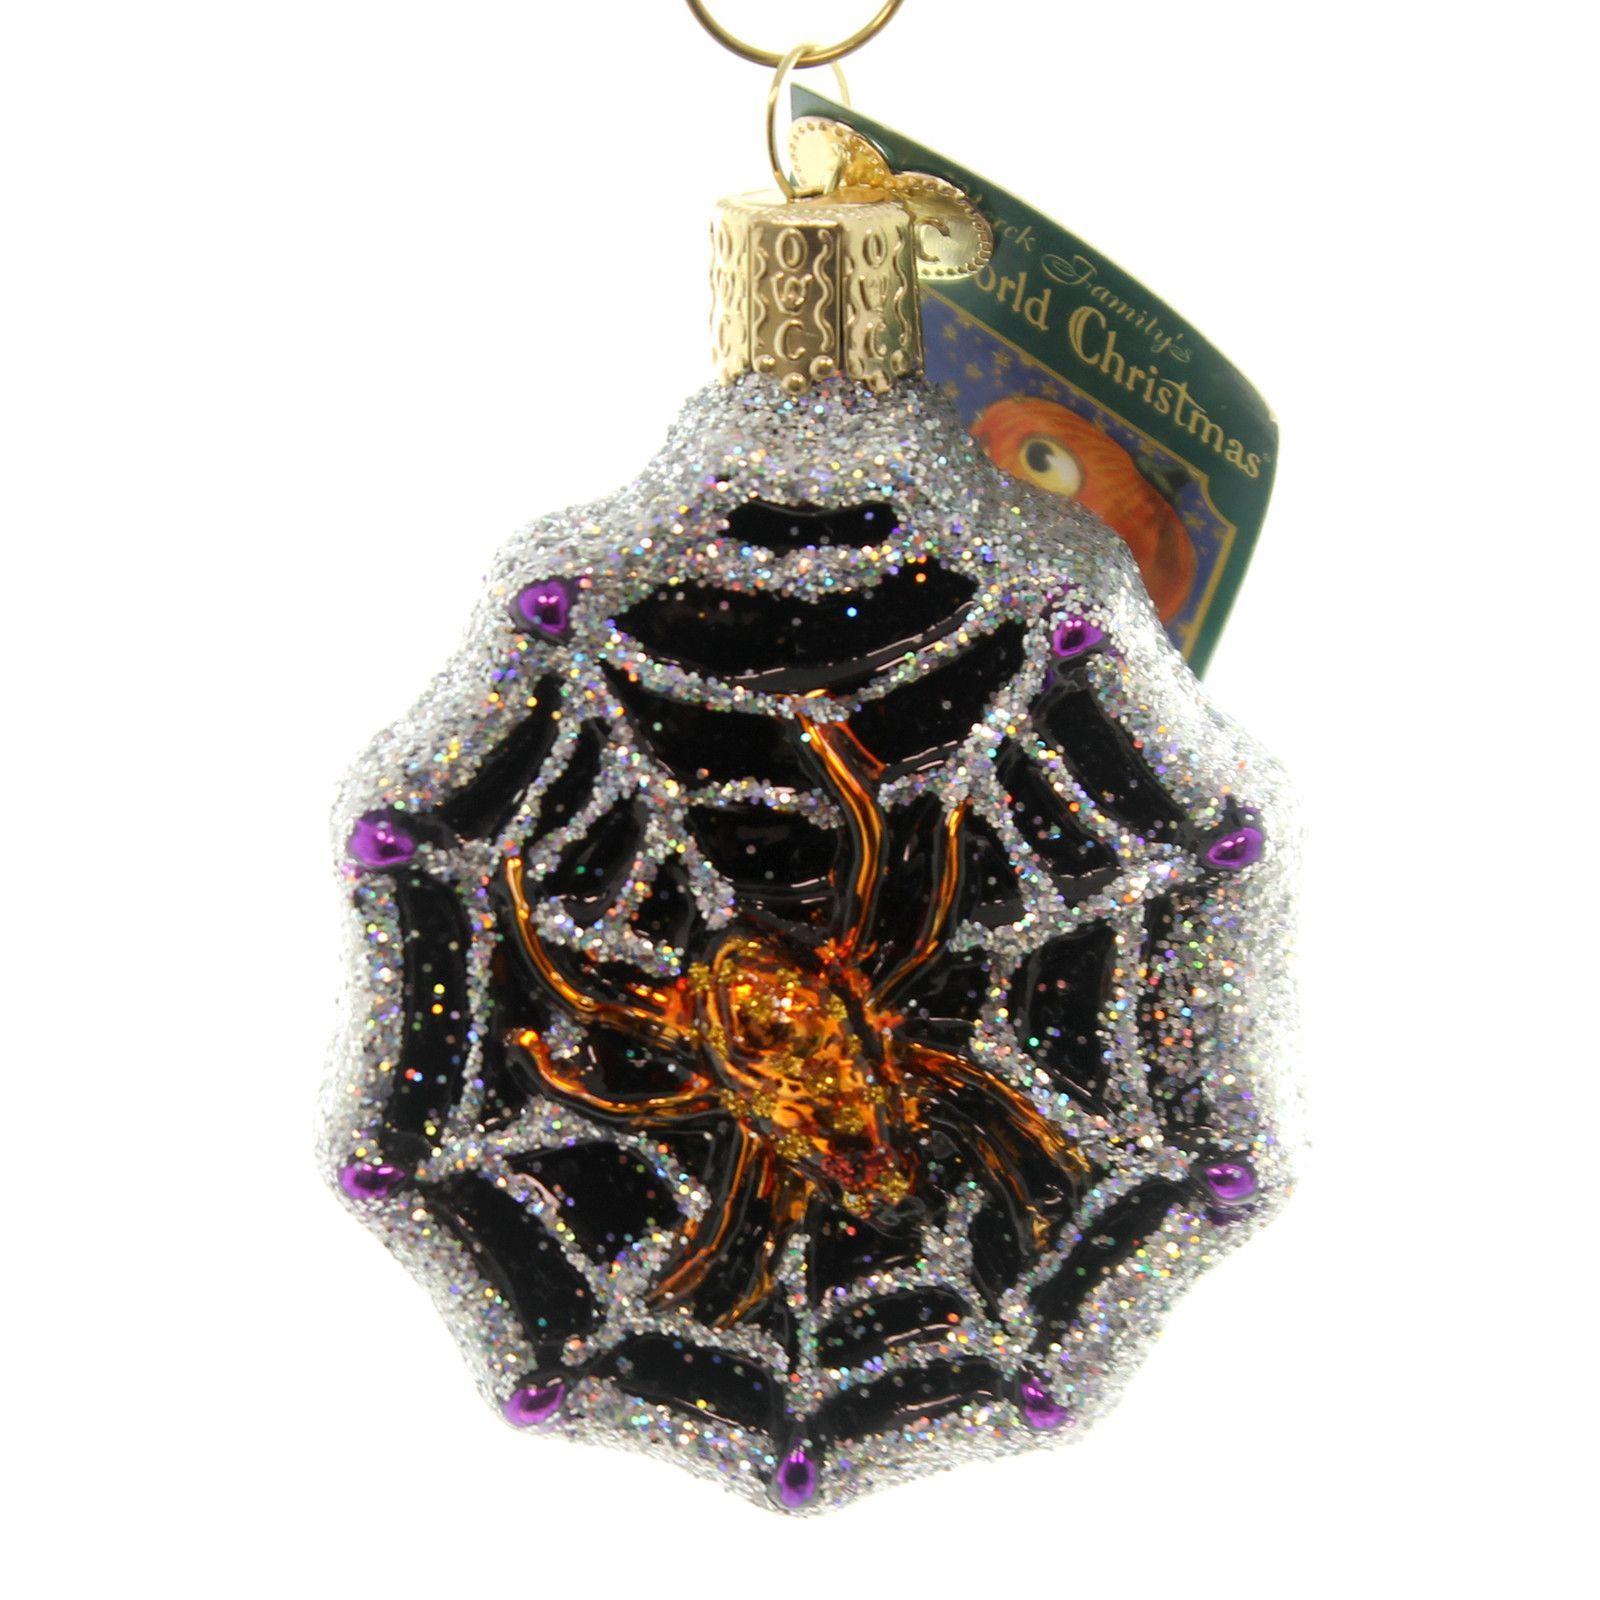 Old World Christmas Spider Web Halloween Glass Ornament ...